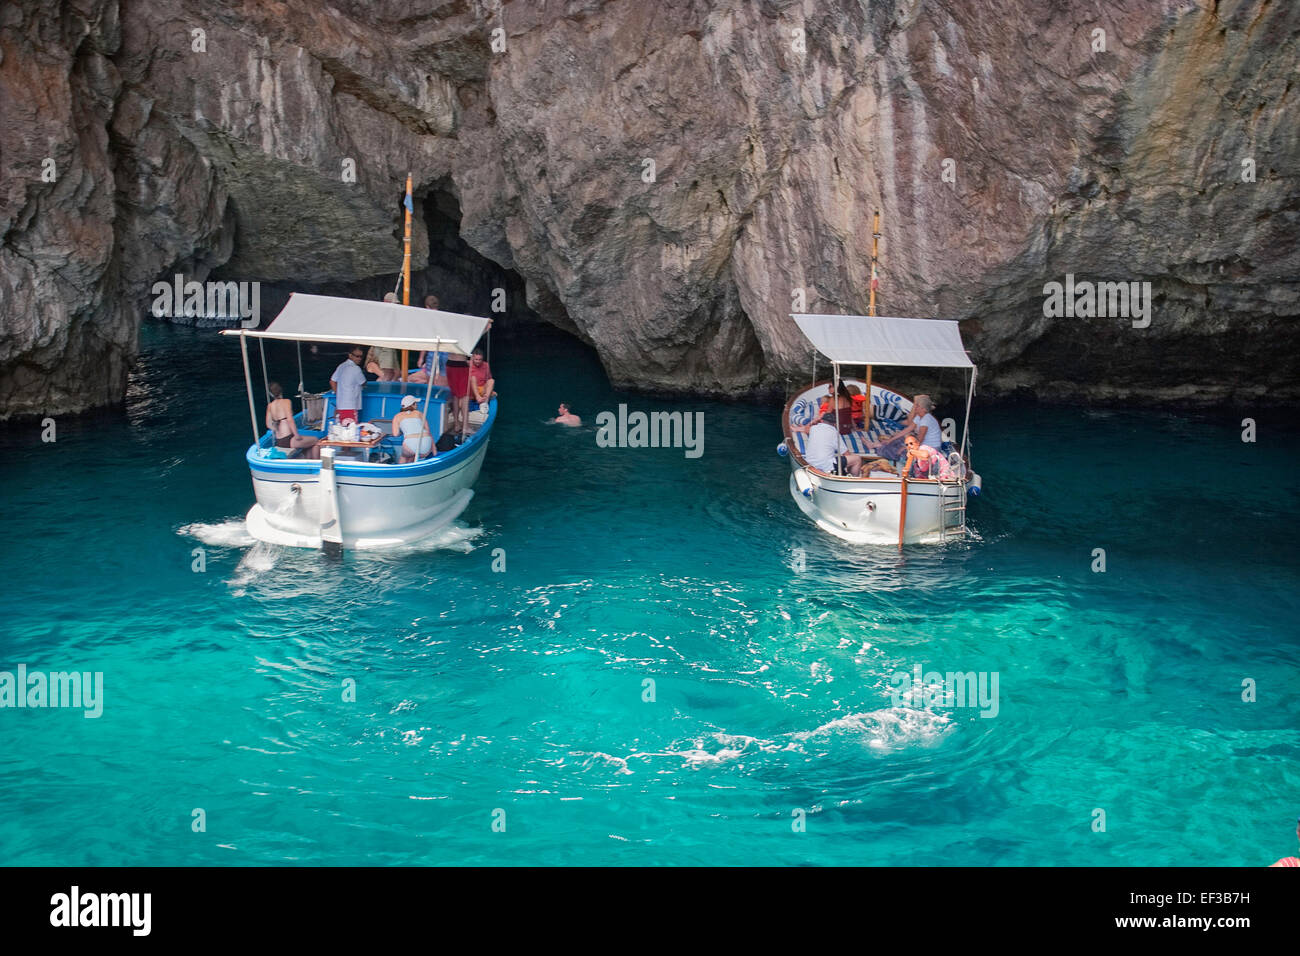 Green grotto isle of capri italy stock photo royalty for Isle of capri tours